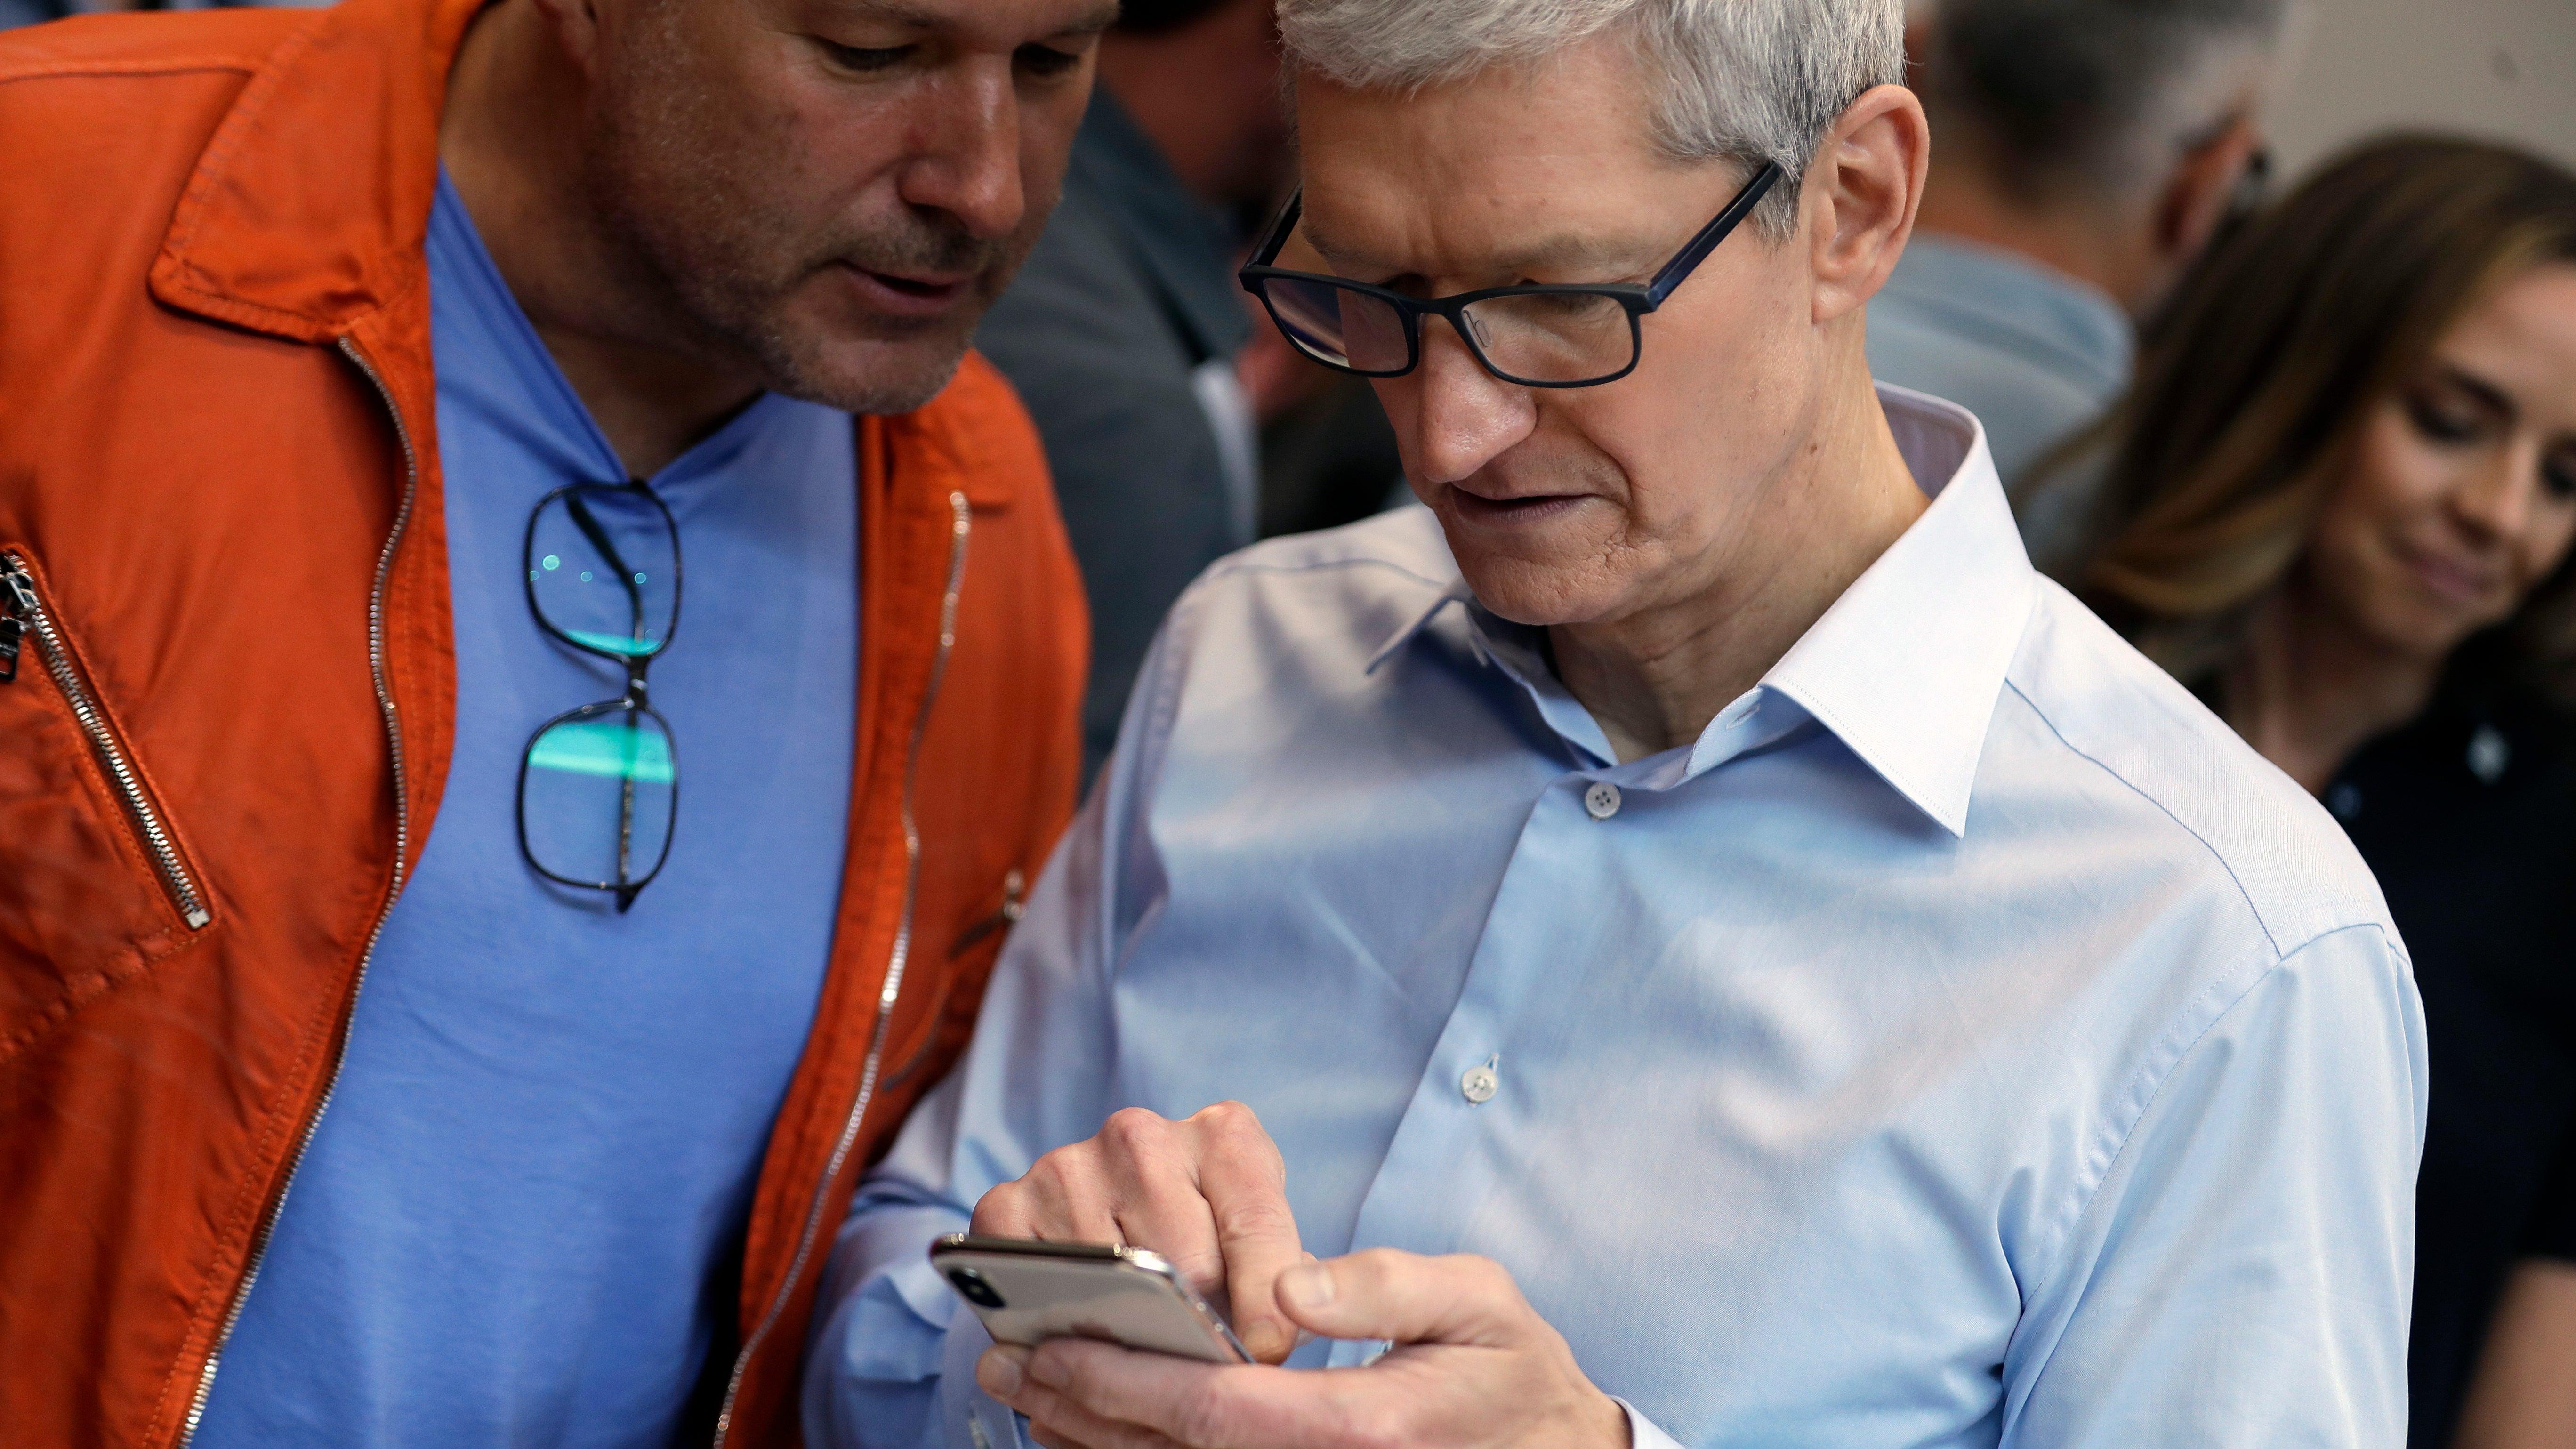 Apple Is Sending Out Push Notifications Bothering People To Watch Carpool Karaoke